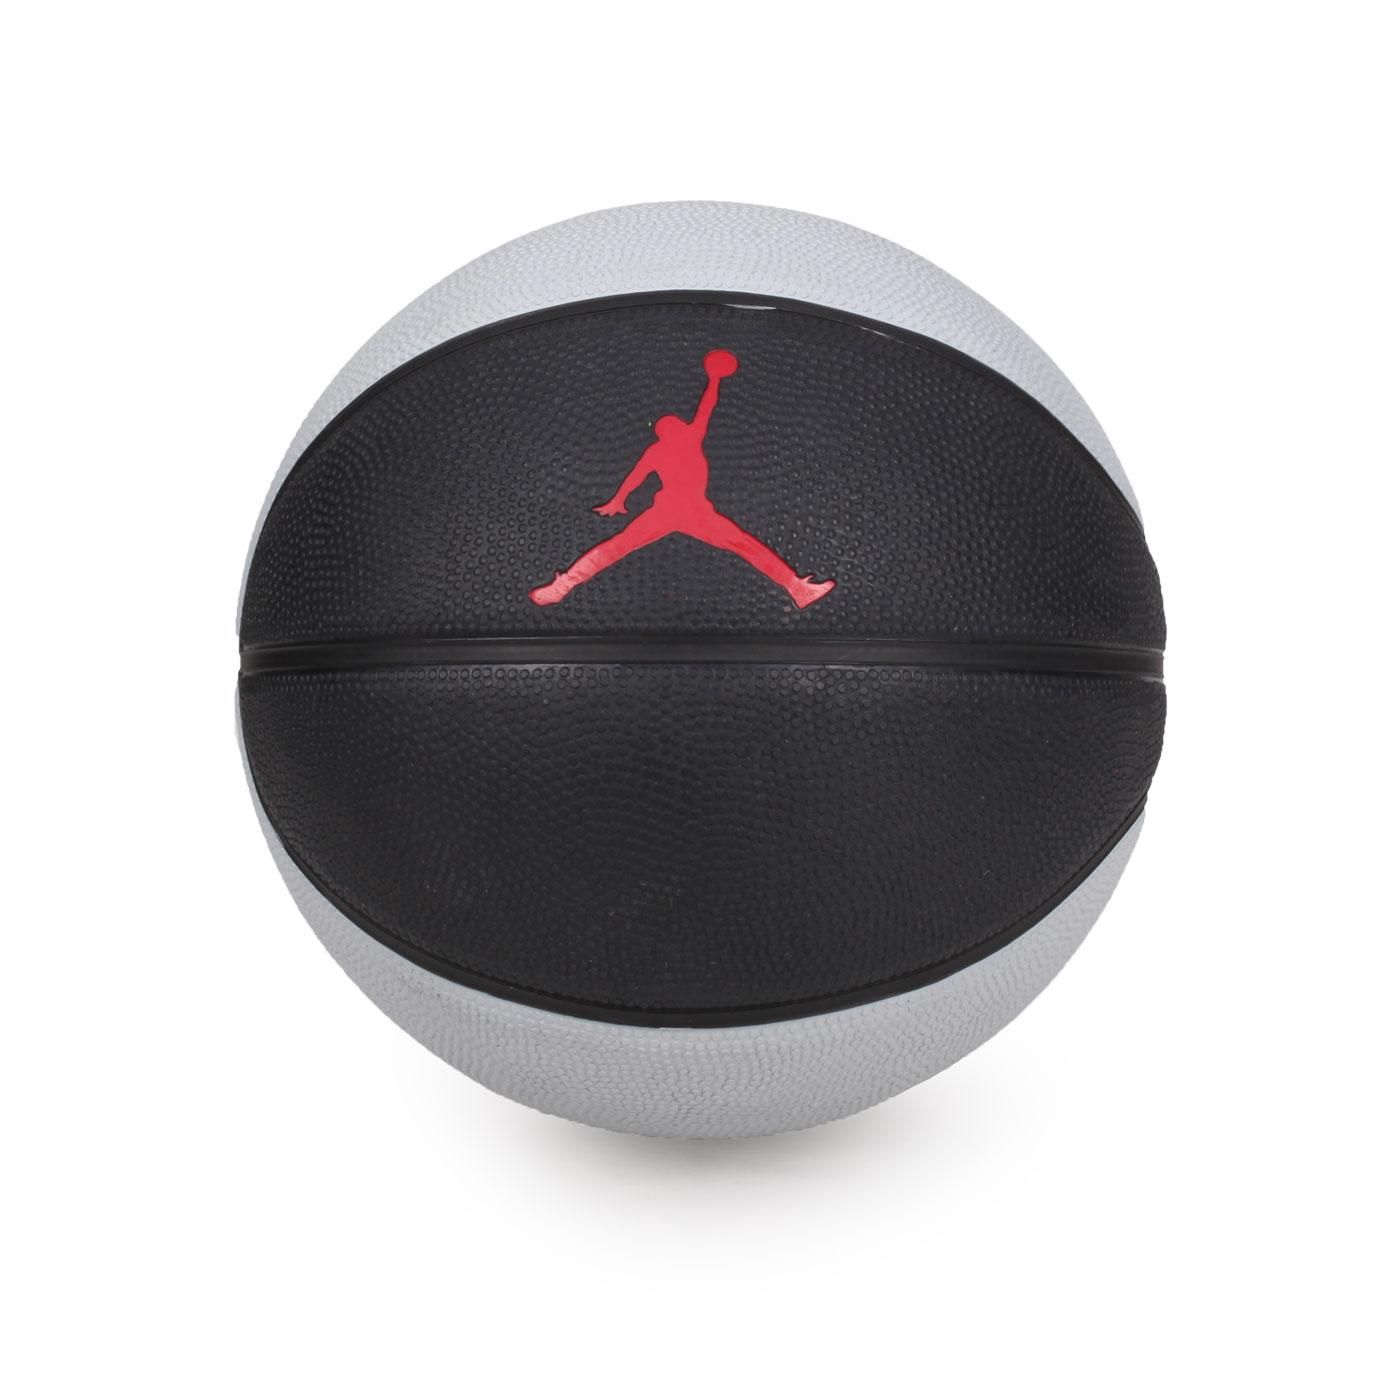 NIKE JORDAN SKILLS 3號籃球 J000188404103 - 黑灰紅